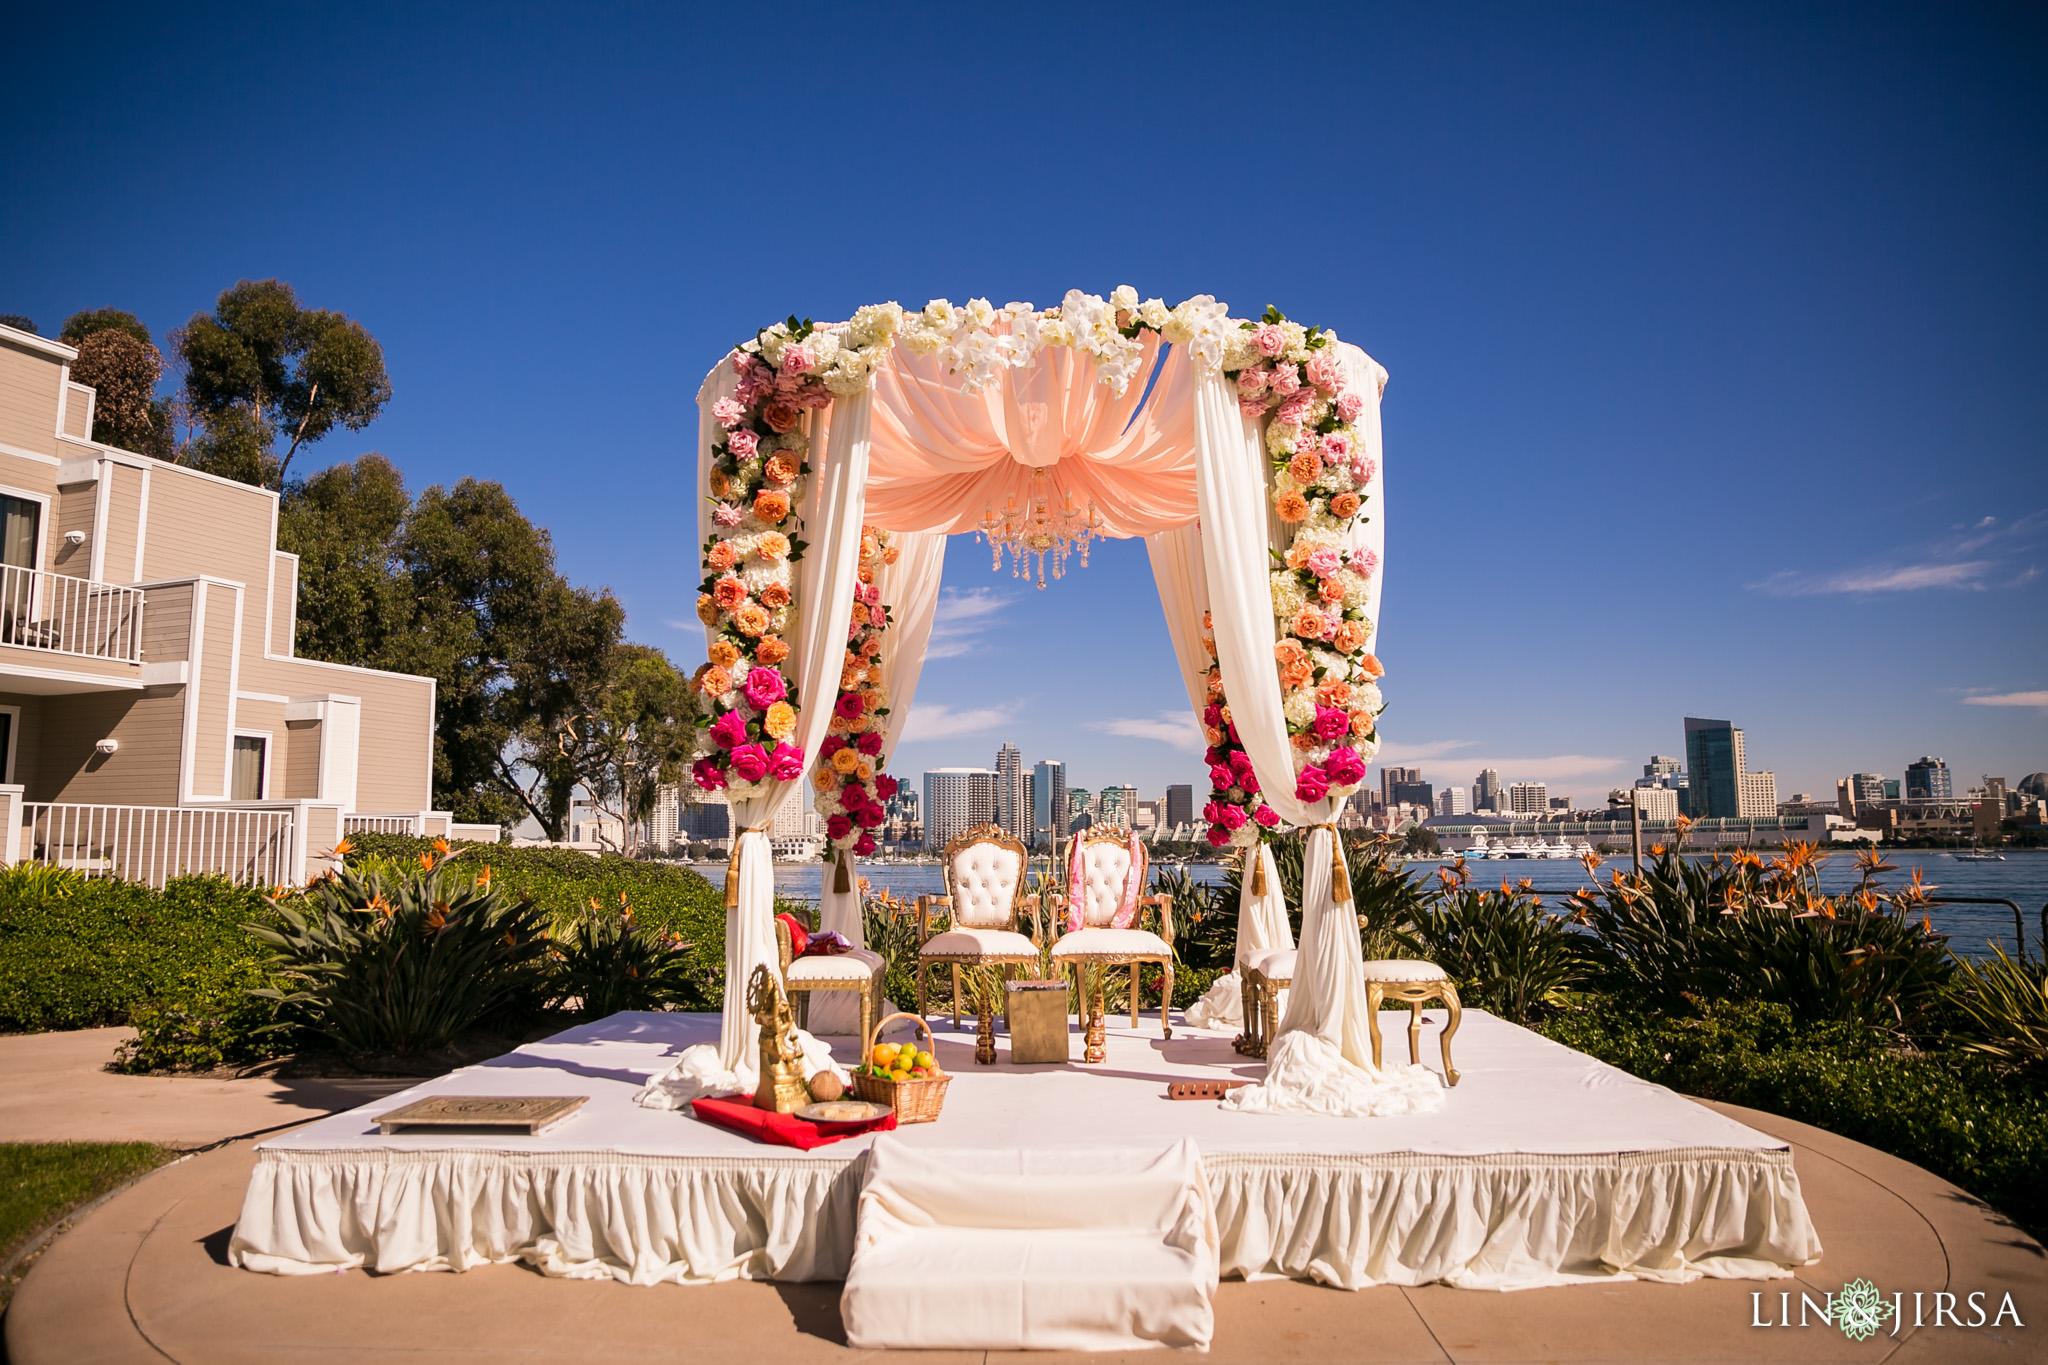 Wedding Venue Coronado Island Marriott Resort Planner Boutique Event Planning Bridal Hair Makeup Dolled Up By Lulu